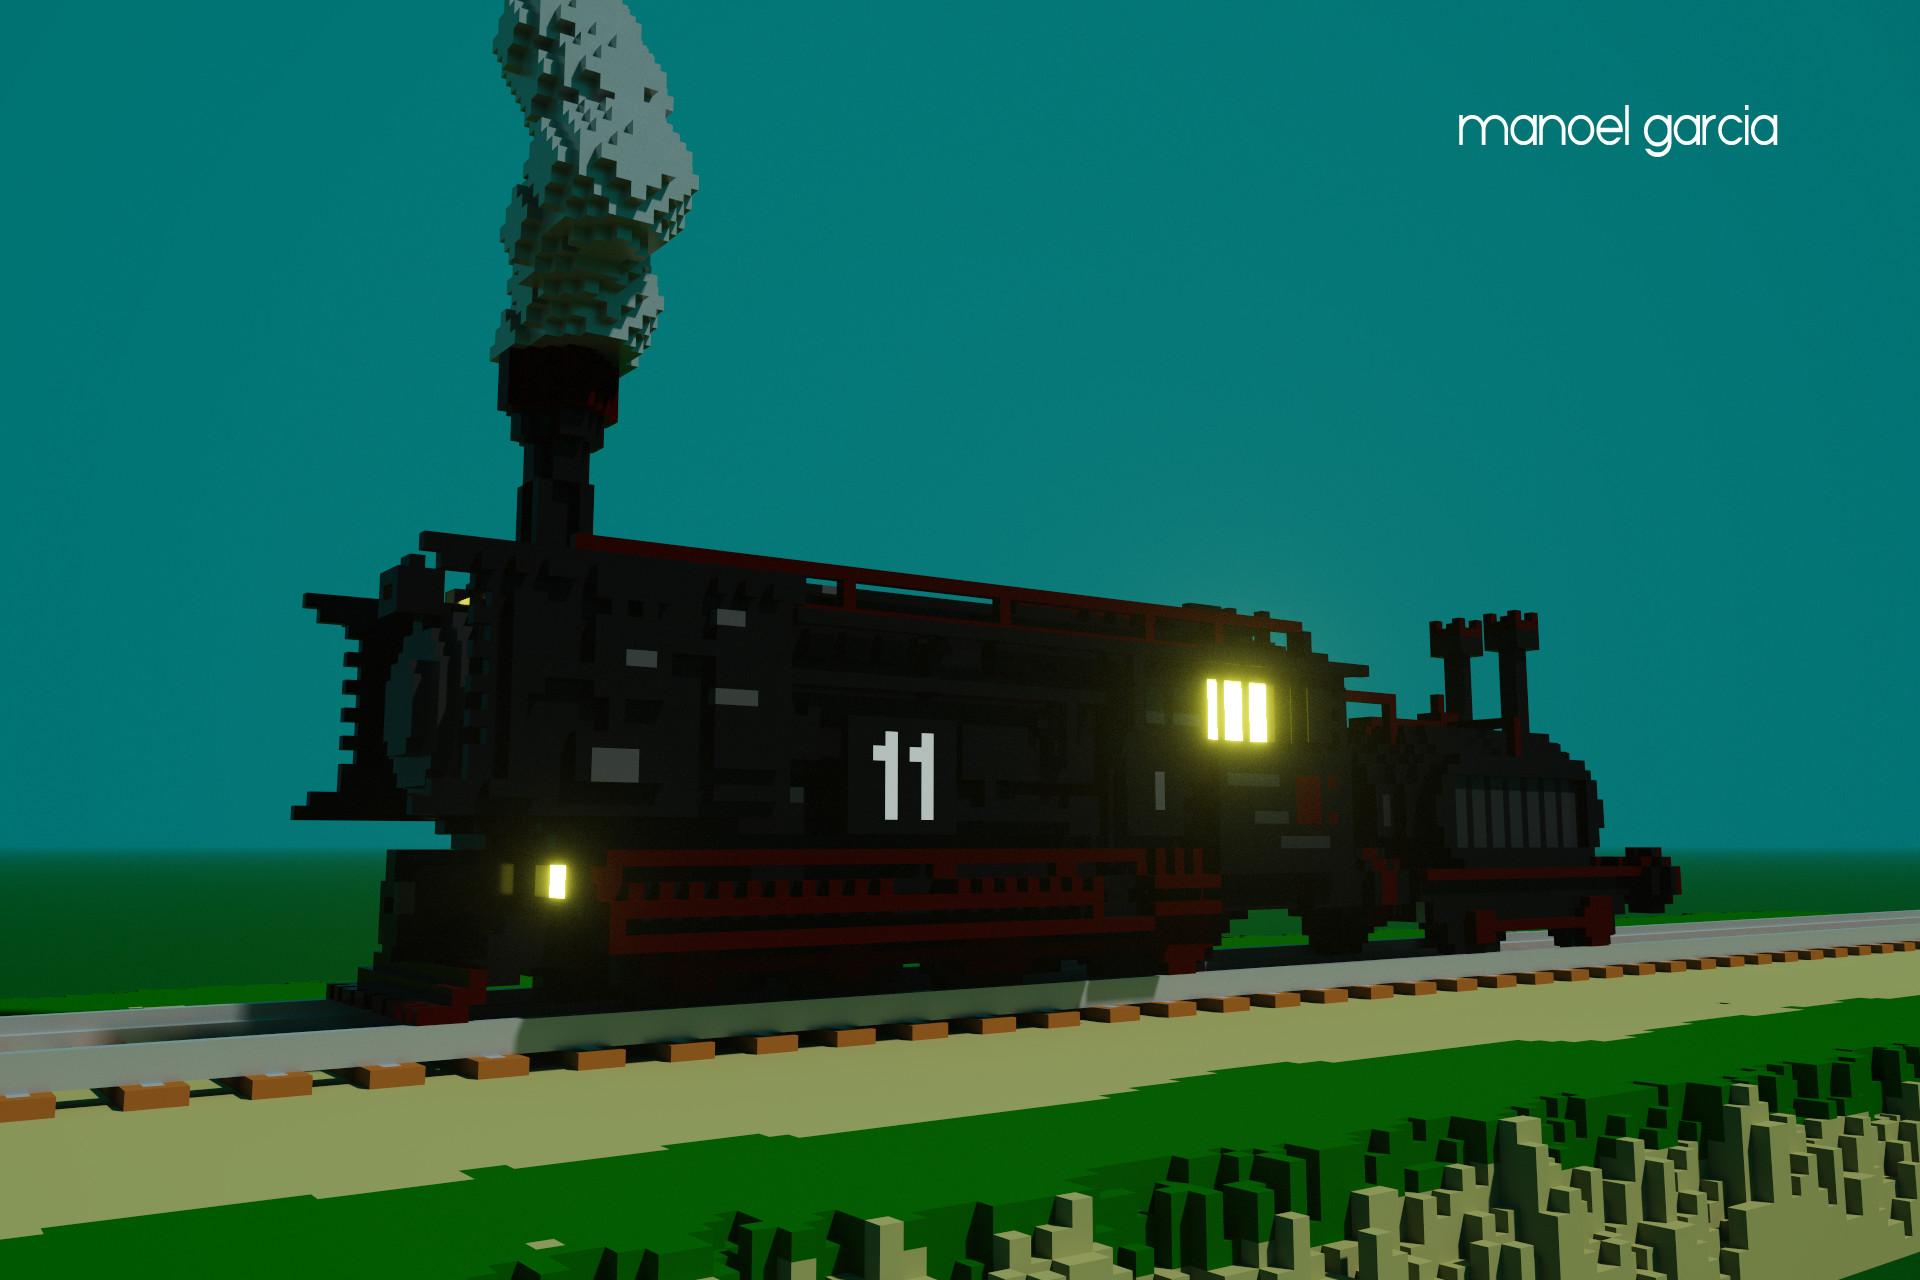 Manoel garcia train